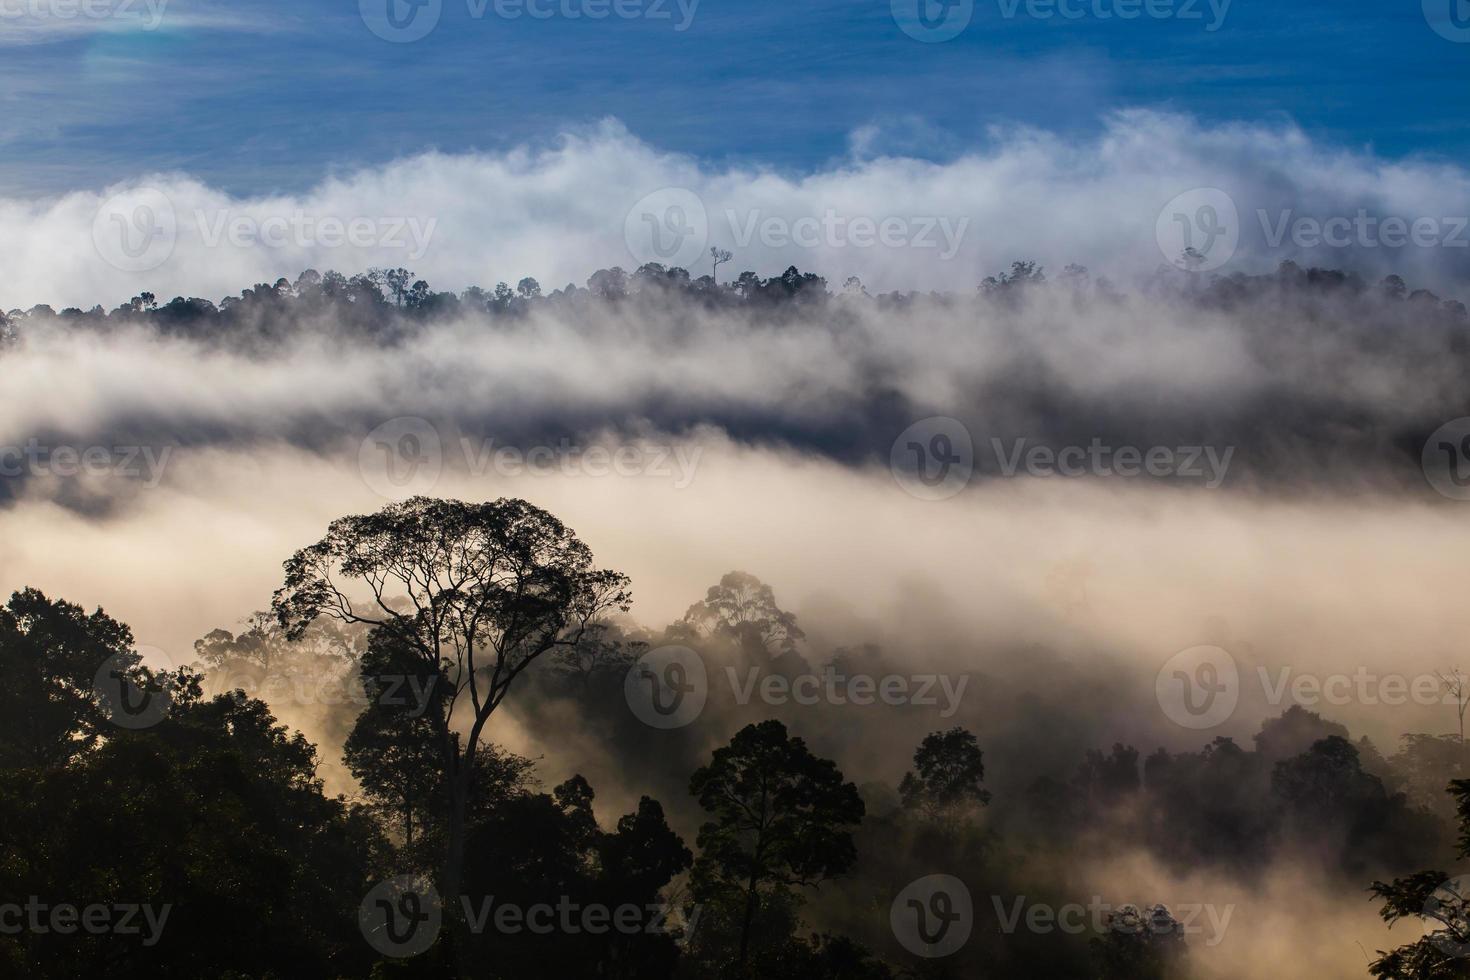 hala-bala narathi war der Morgenlicht Landschaftsblick (Regenwälder foto